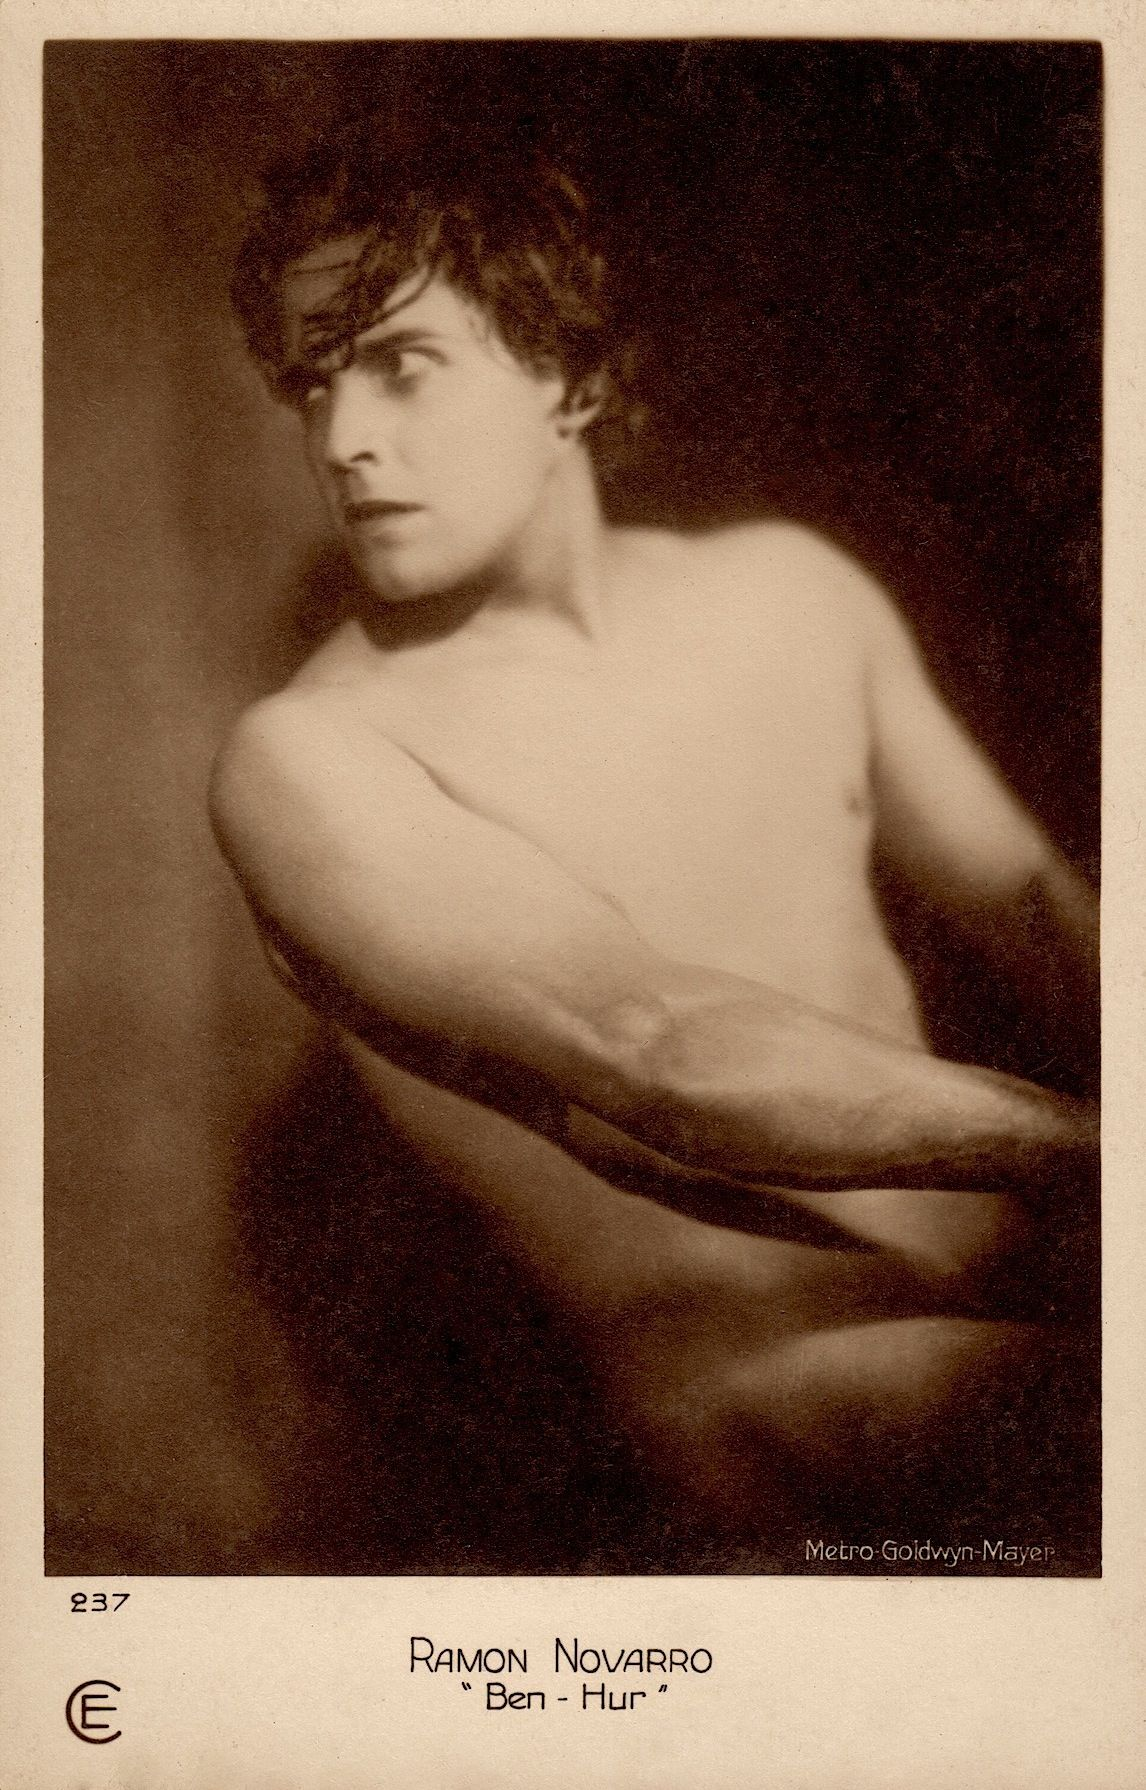 Ramon novarro nude in ben hur 1925 very rare vintage cinemagazine ramon novarro nude in ben hur 1925 very rare vintage cinemagazine paris postcard minkshmink kristyandbryce Images